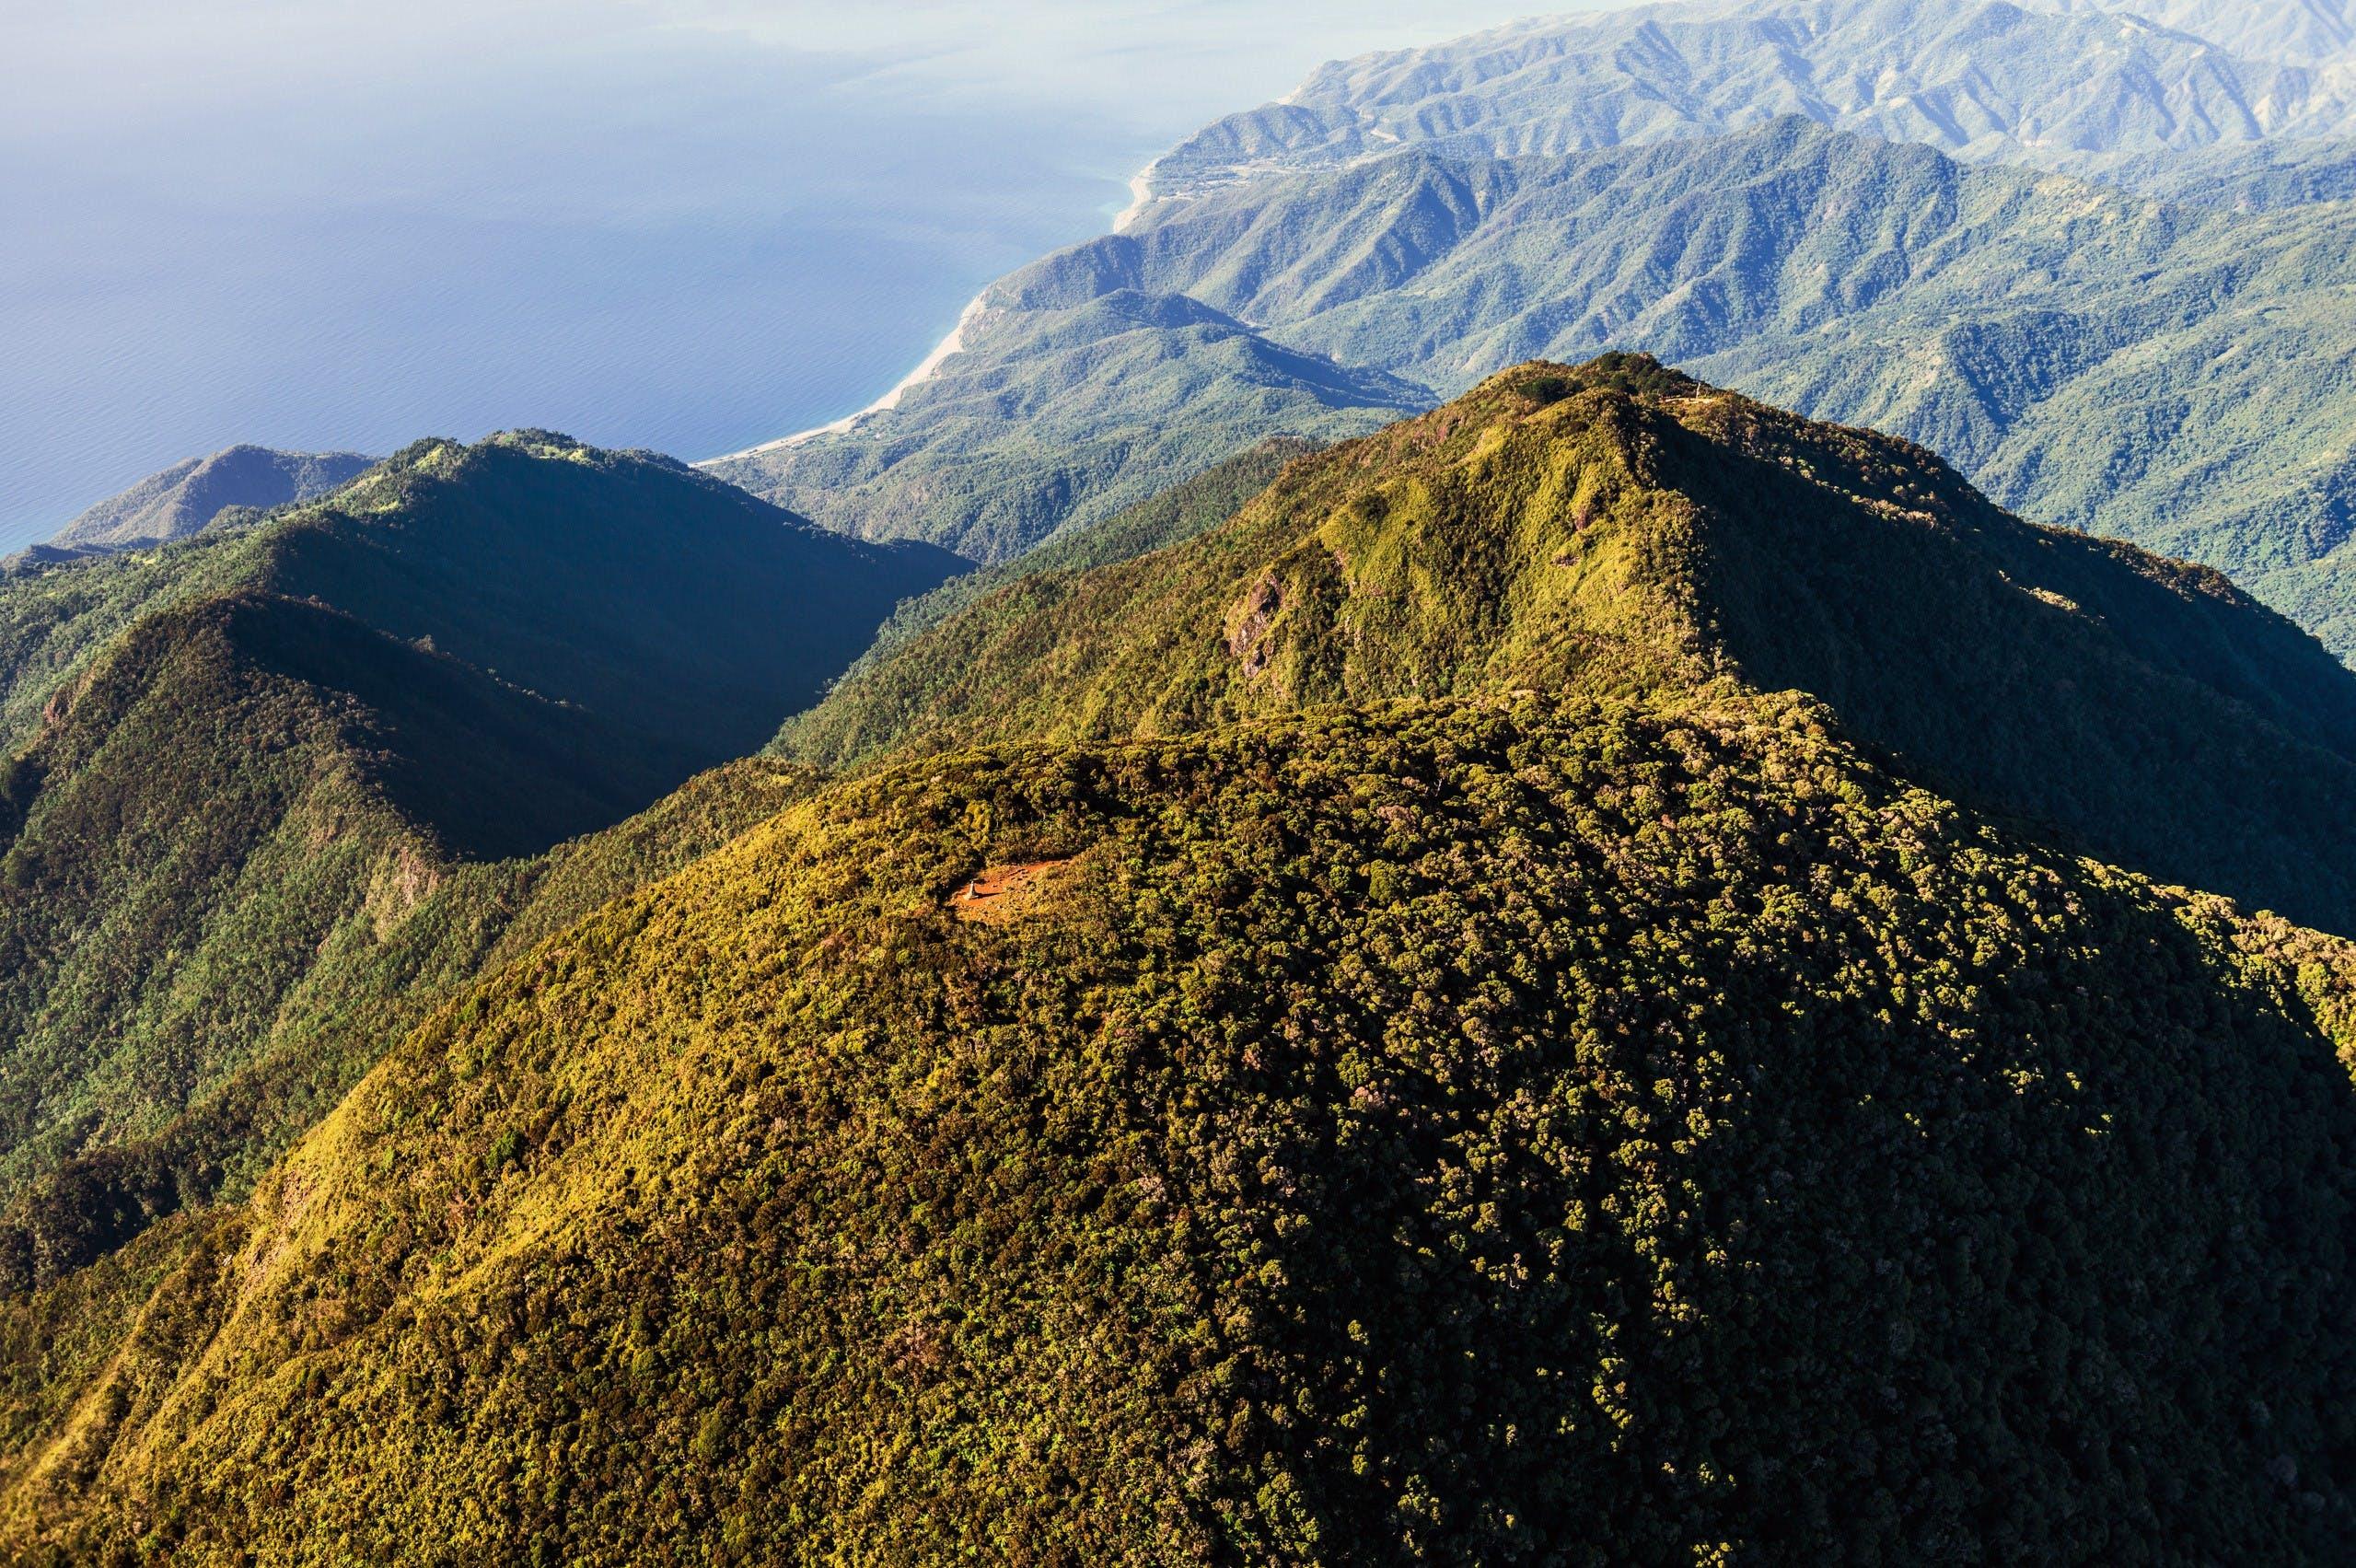 Sierra Maestra Mountains - Cuba